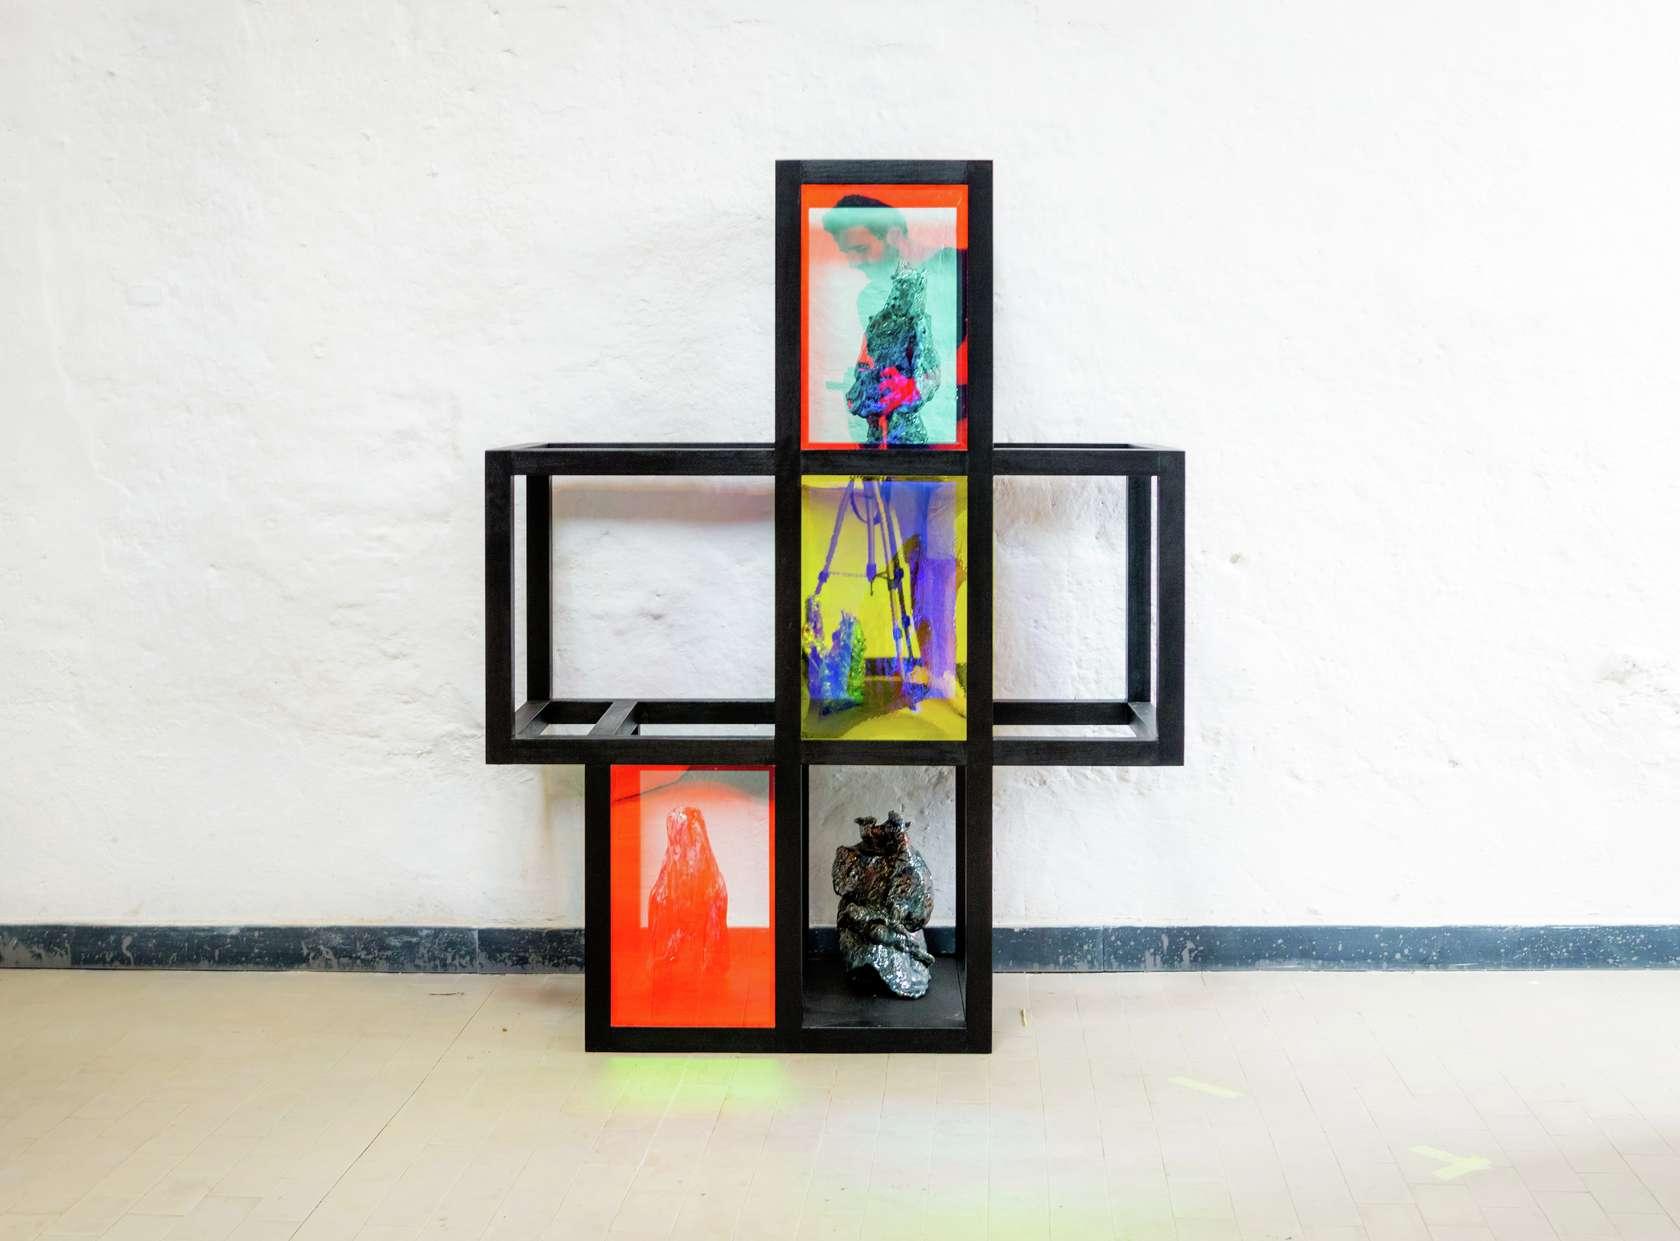 Salvatore Arancio, Like a Sort of Pompeii in Reverse, (Cabinet III), 2019 Structure en bois peint, filtres dichroïques et quatre céramiques136 × 106 × 38 cm / 53 1/2 × 41 6/8 × 15  in.